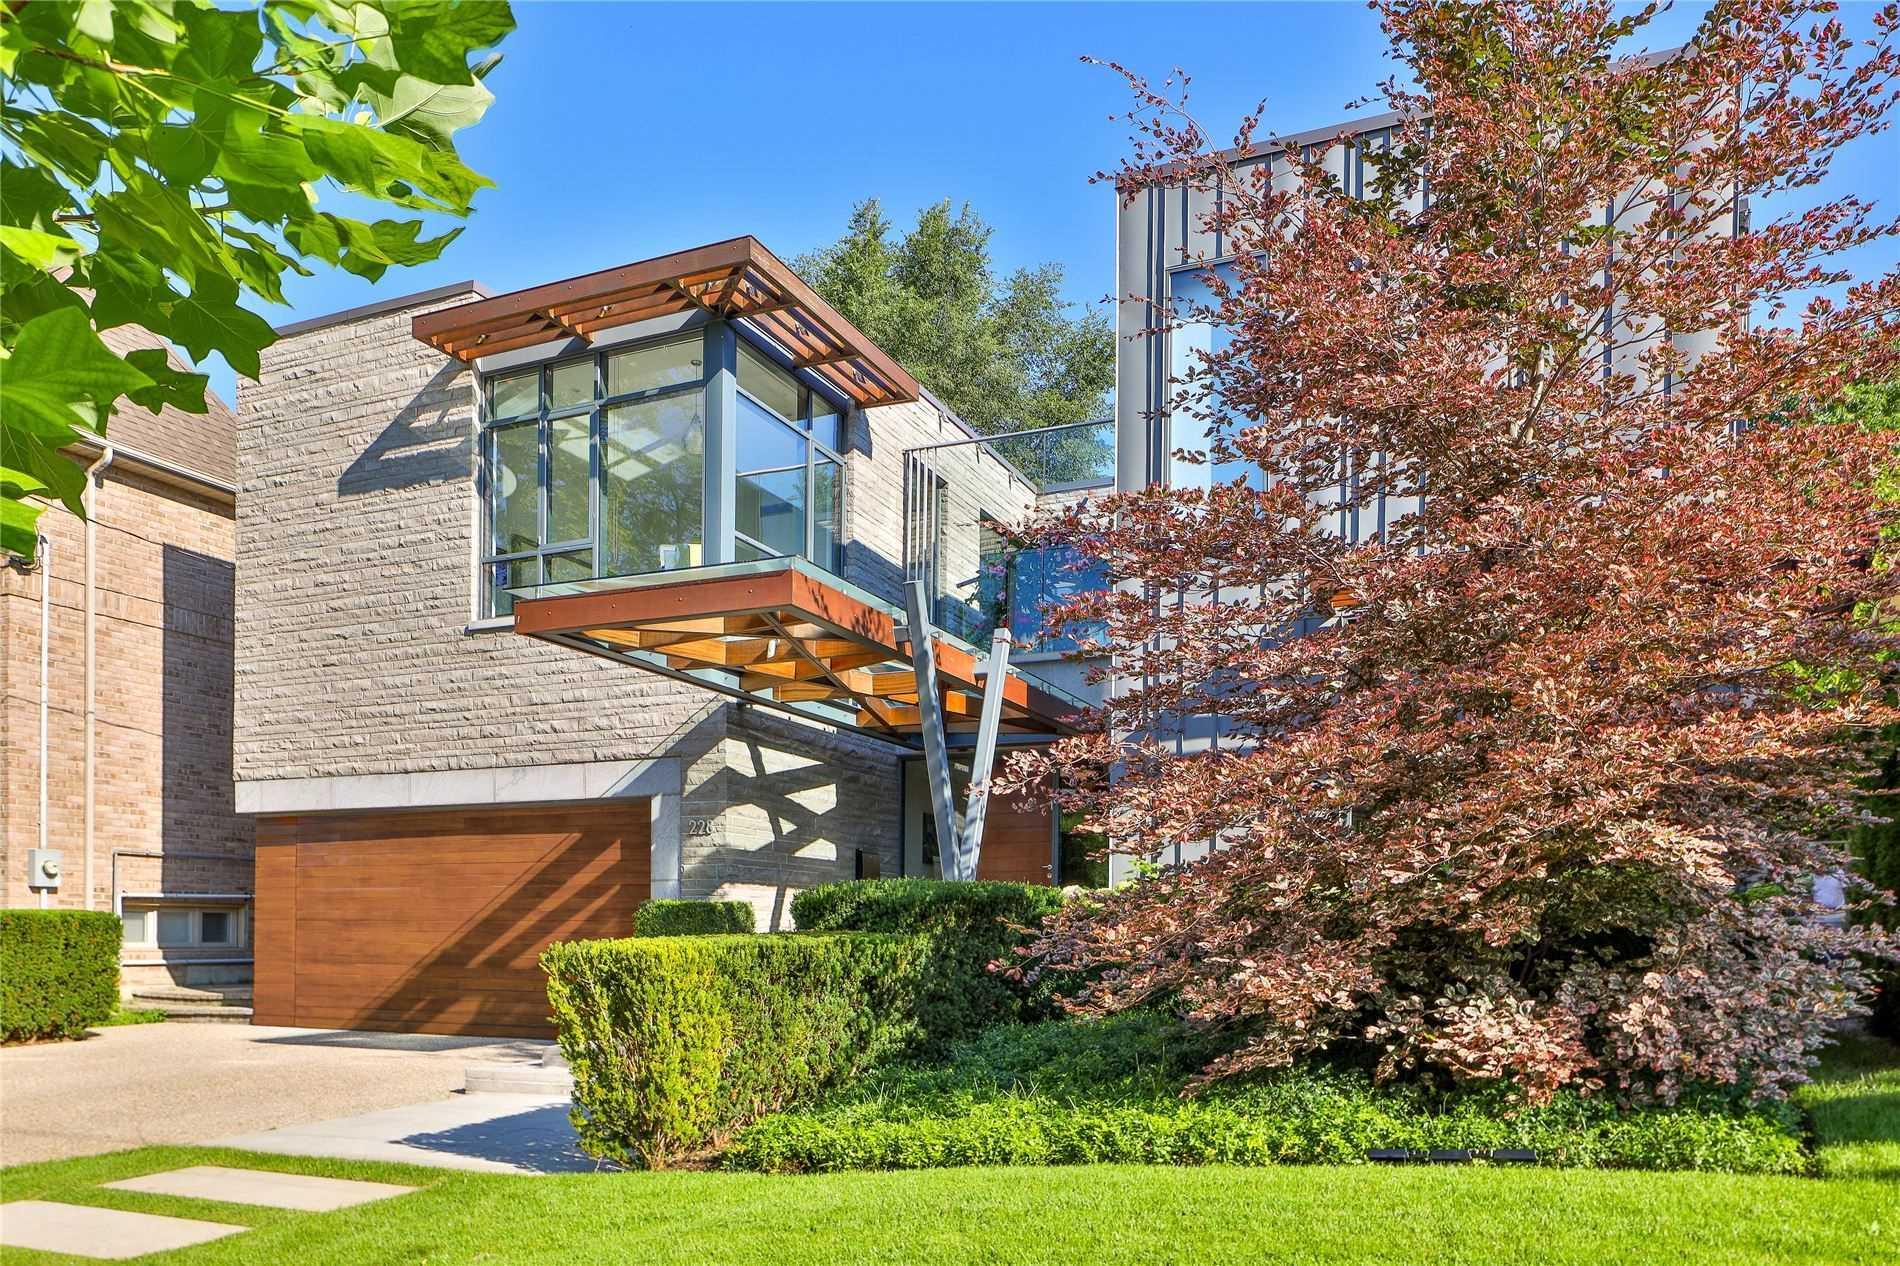 228 Coldstream Ave, Toronto, Ontario M5N1Y3, 5 Bedrooms Bedrooms, 10 Rooms Rooms,7 BathroomsBathrooms,Detached,For Sale,Coldstream,C5336559